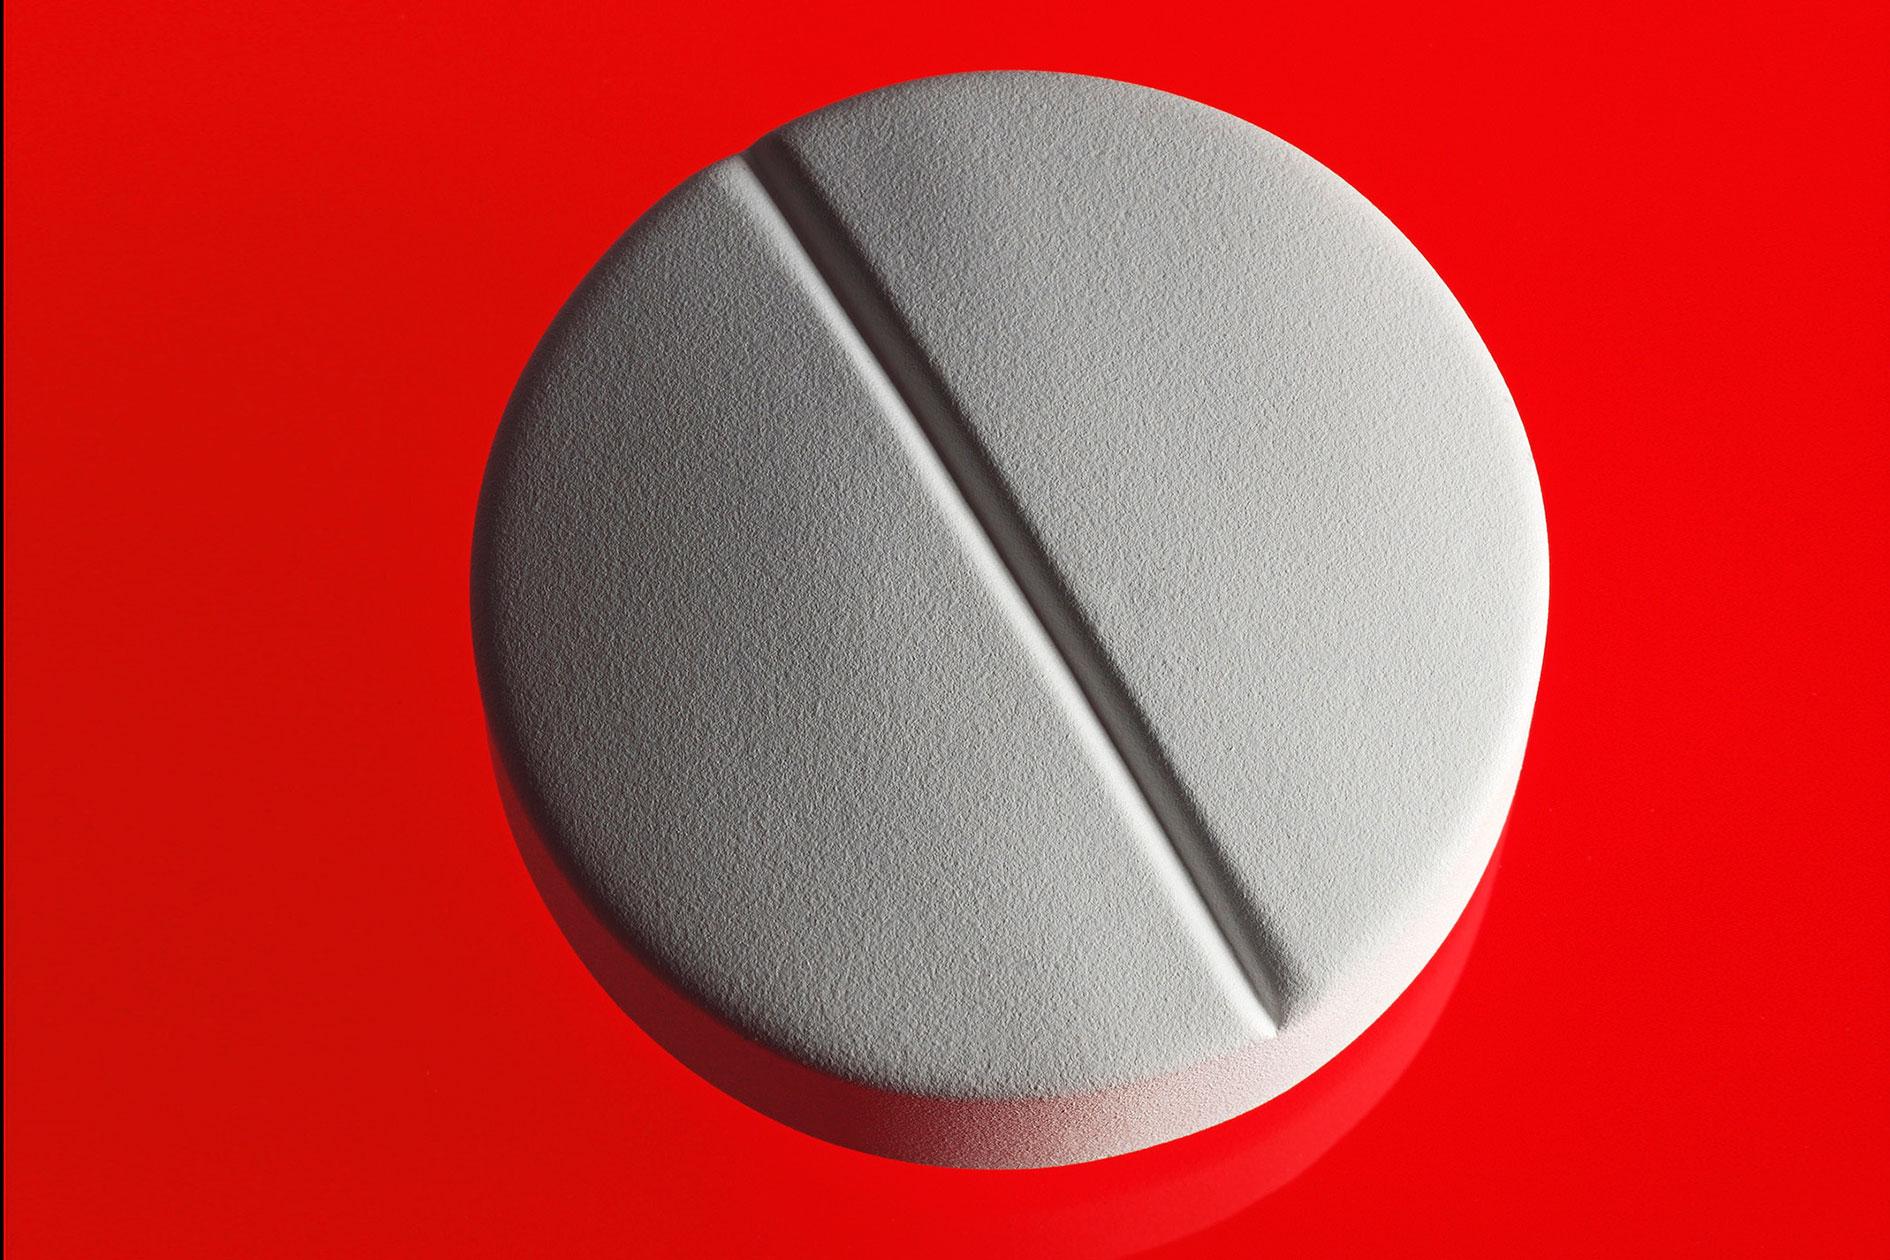 PlamenPetkov_MEDICAL_Pill_H_0001_FF.jpg